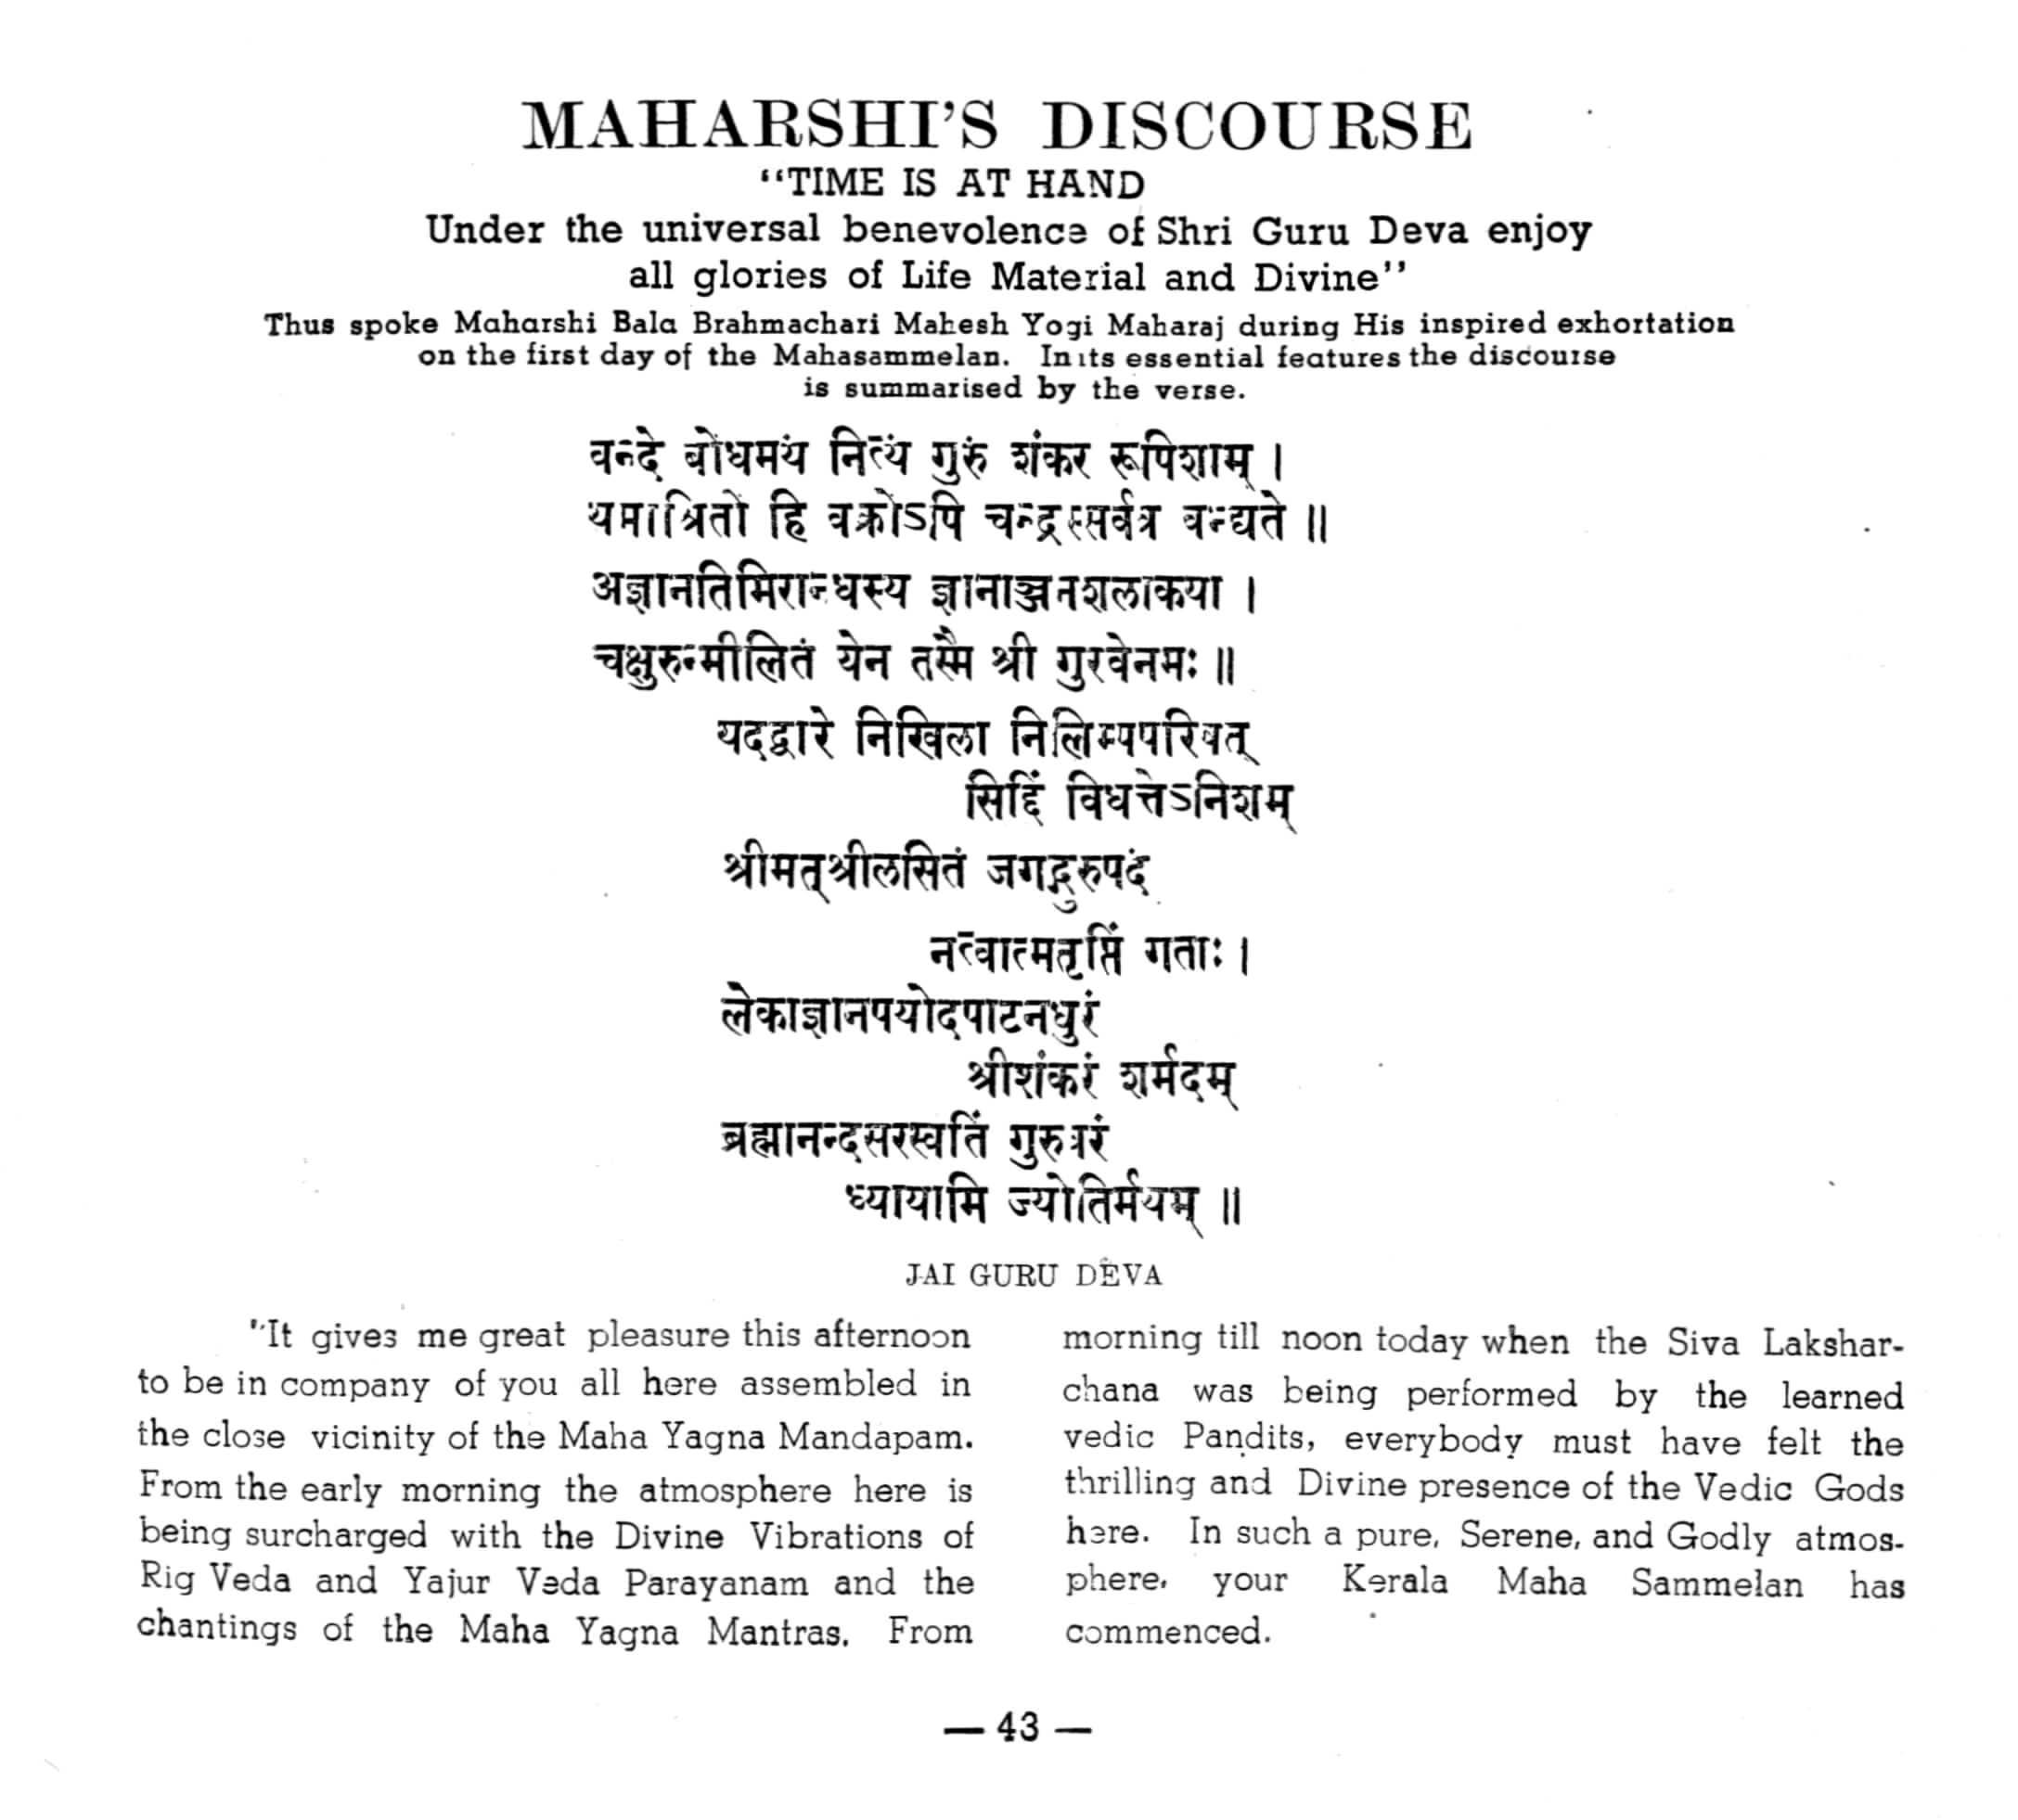 sanskrit essays on water conservation Essays on essay in sanskrit on conservation of water essay on water conservationjpg poster, be viewed as a little drip,  essay on water conservation.